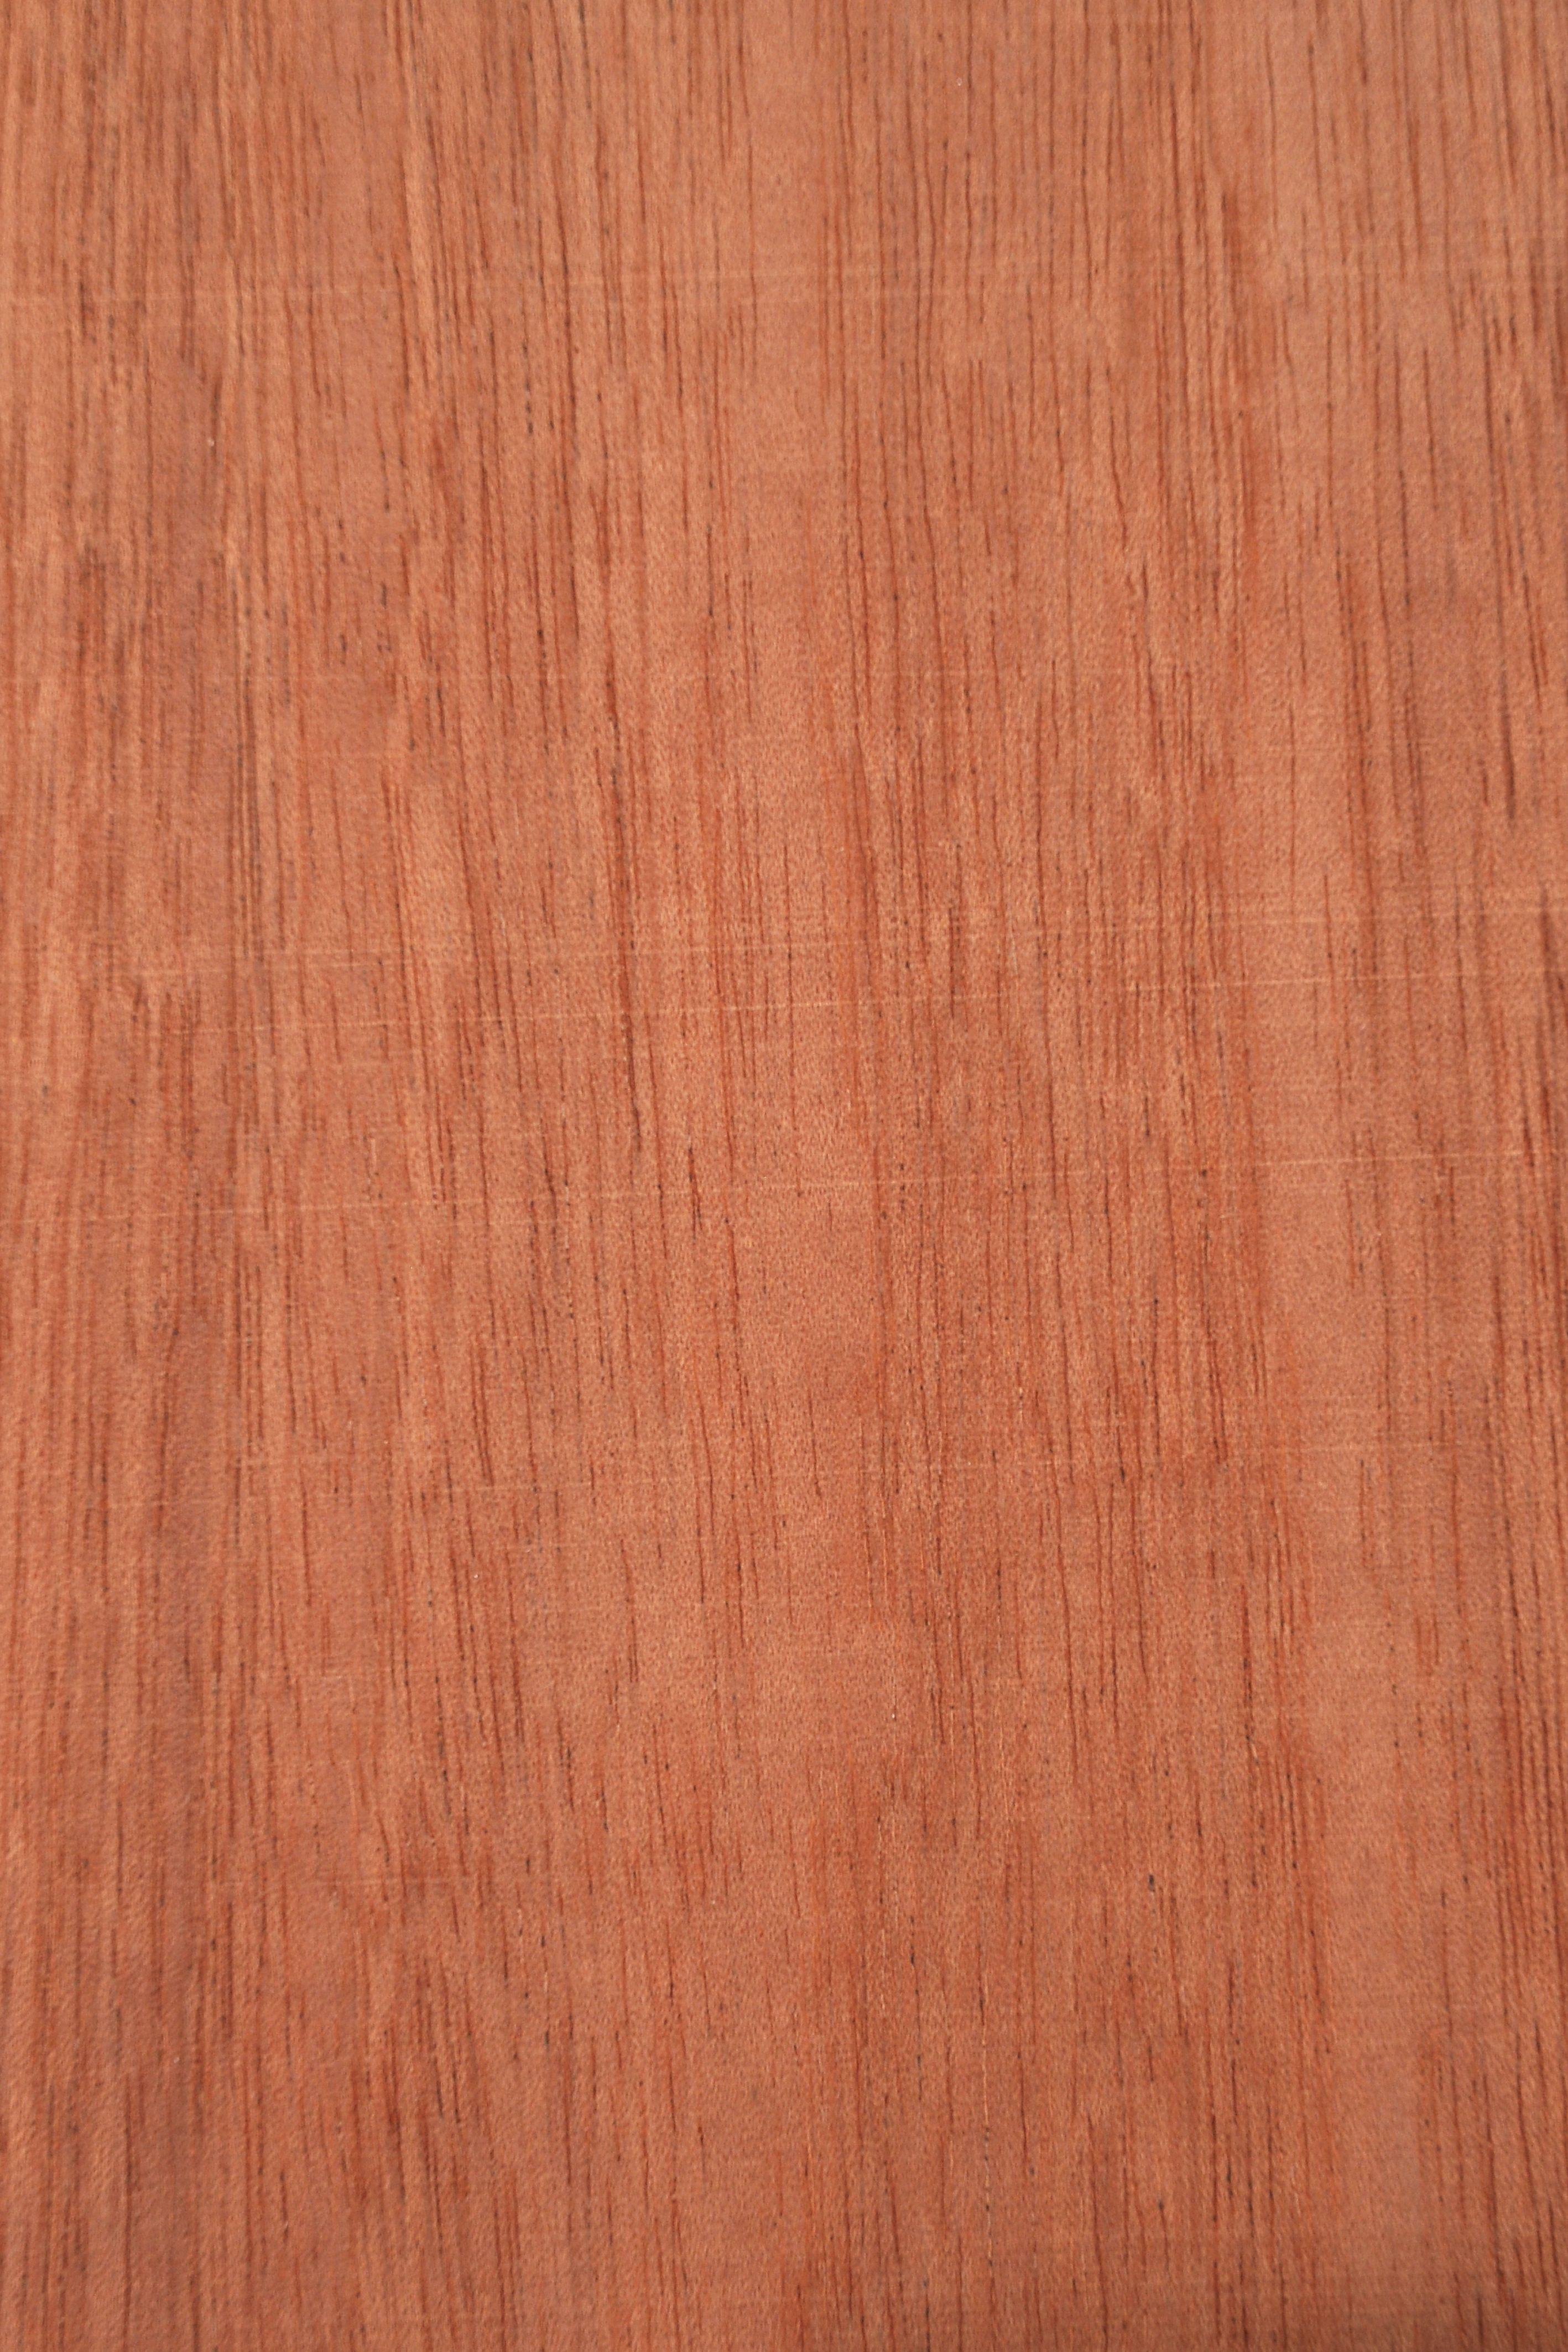 Sapele   Timber Veneer Colour Range   Pinterest